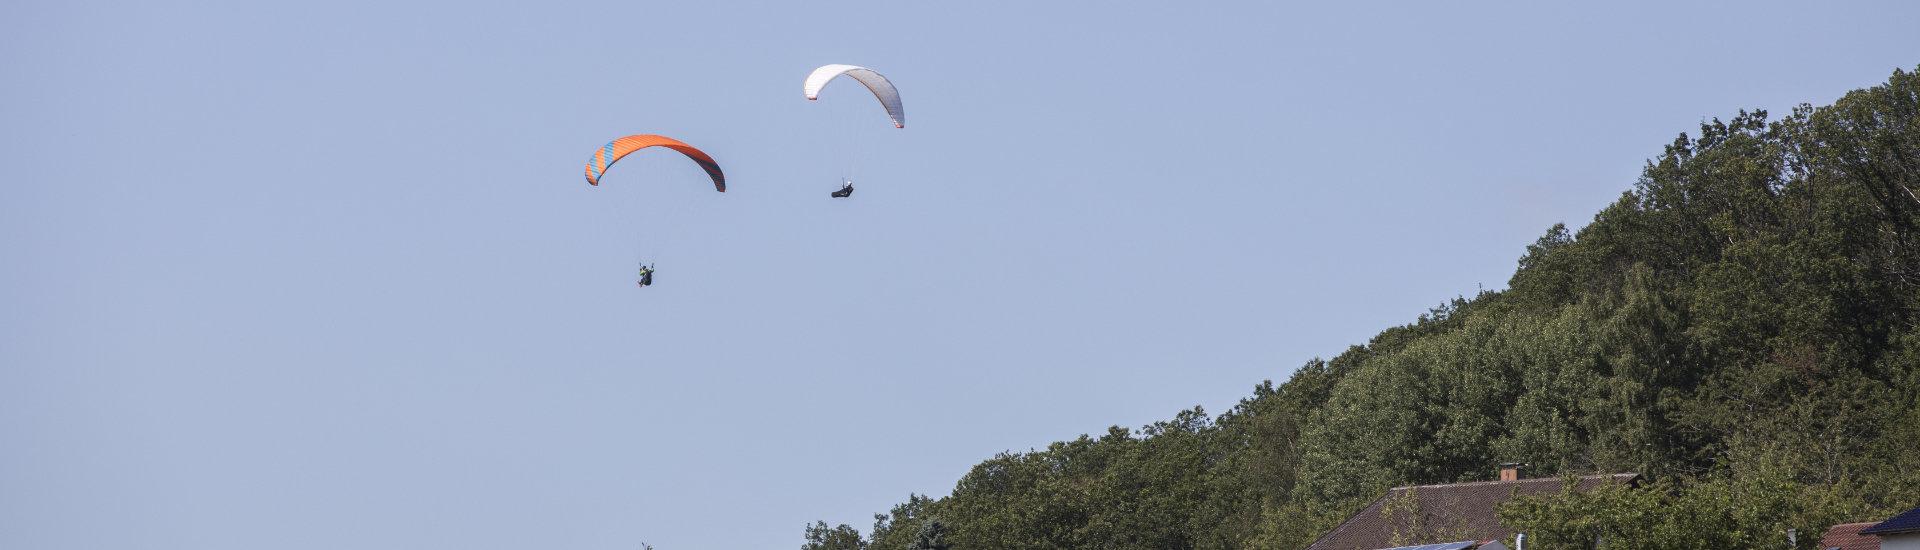 Foto: Drachenflieger/Paraglider am Himmel